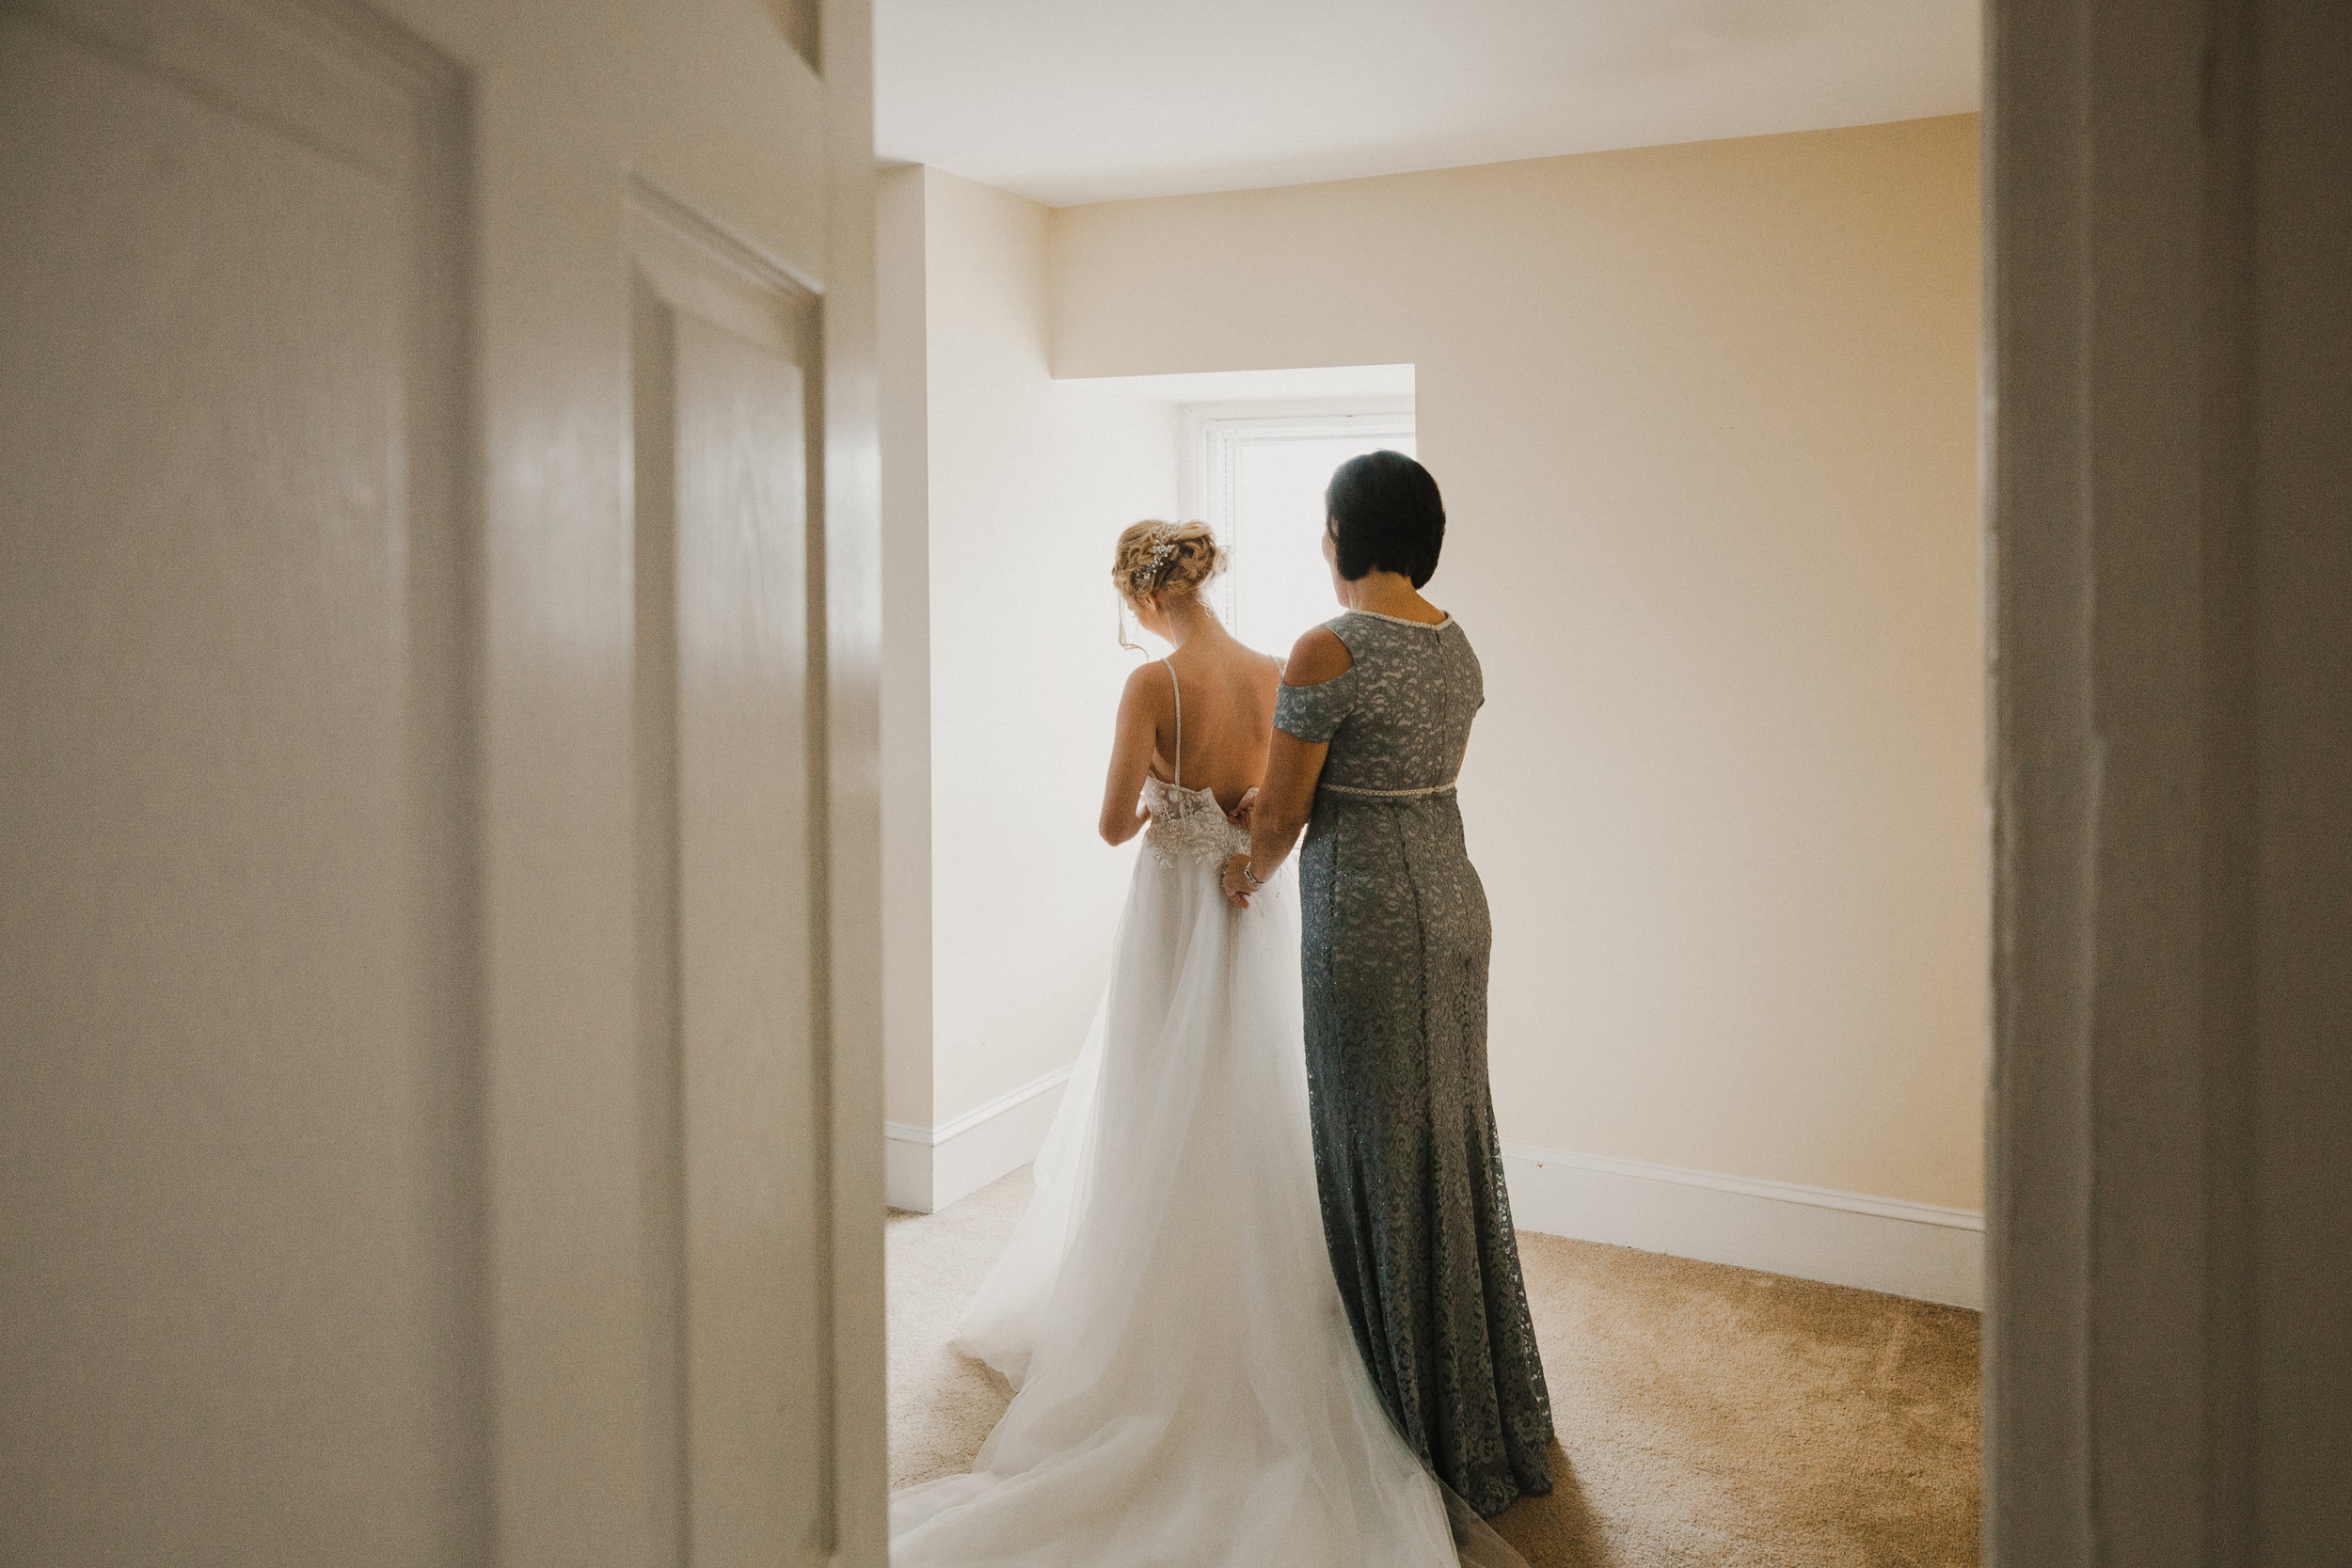 dotw_wedding_graziano-3443.jpg